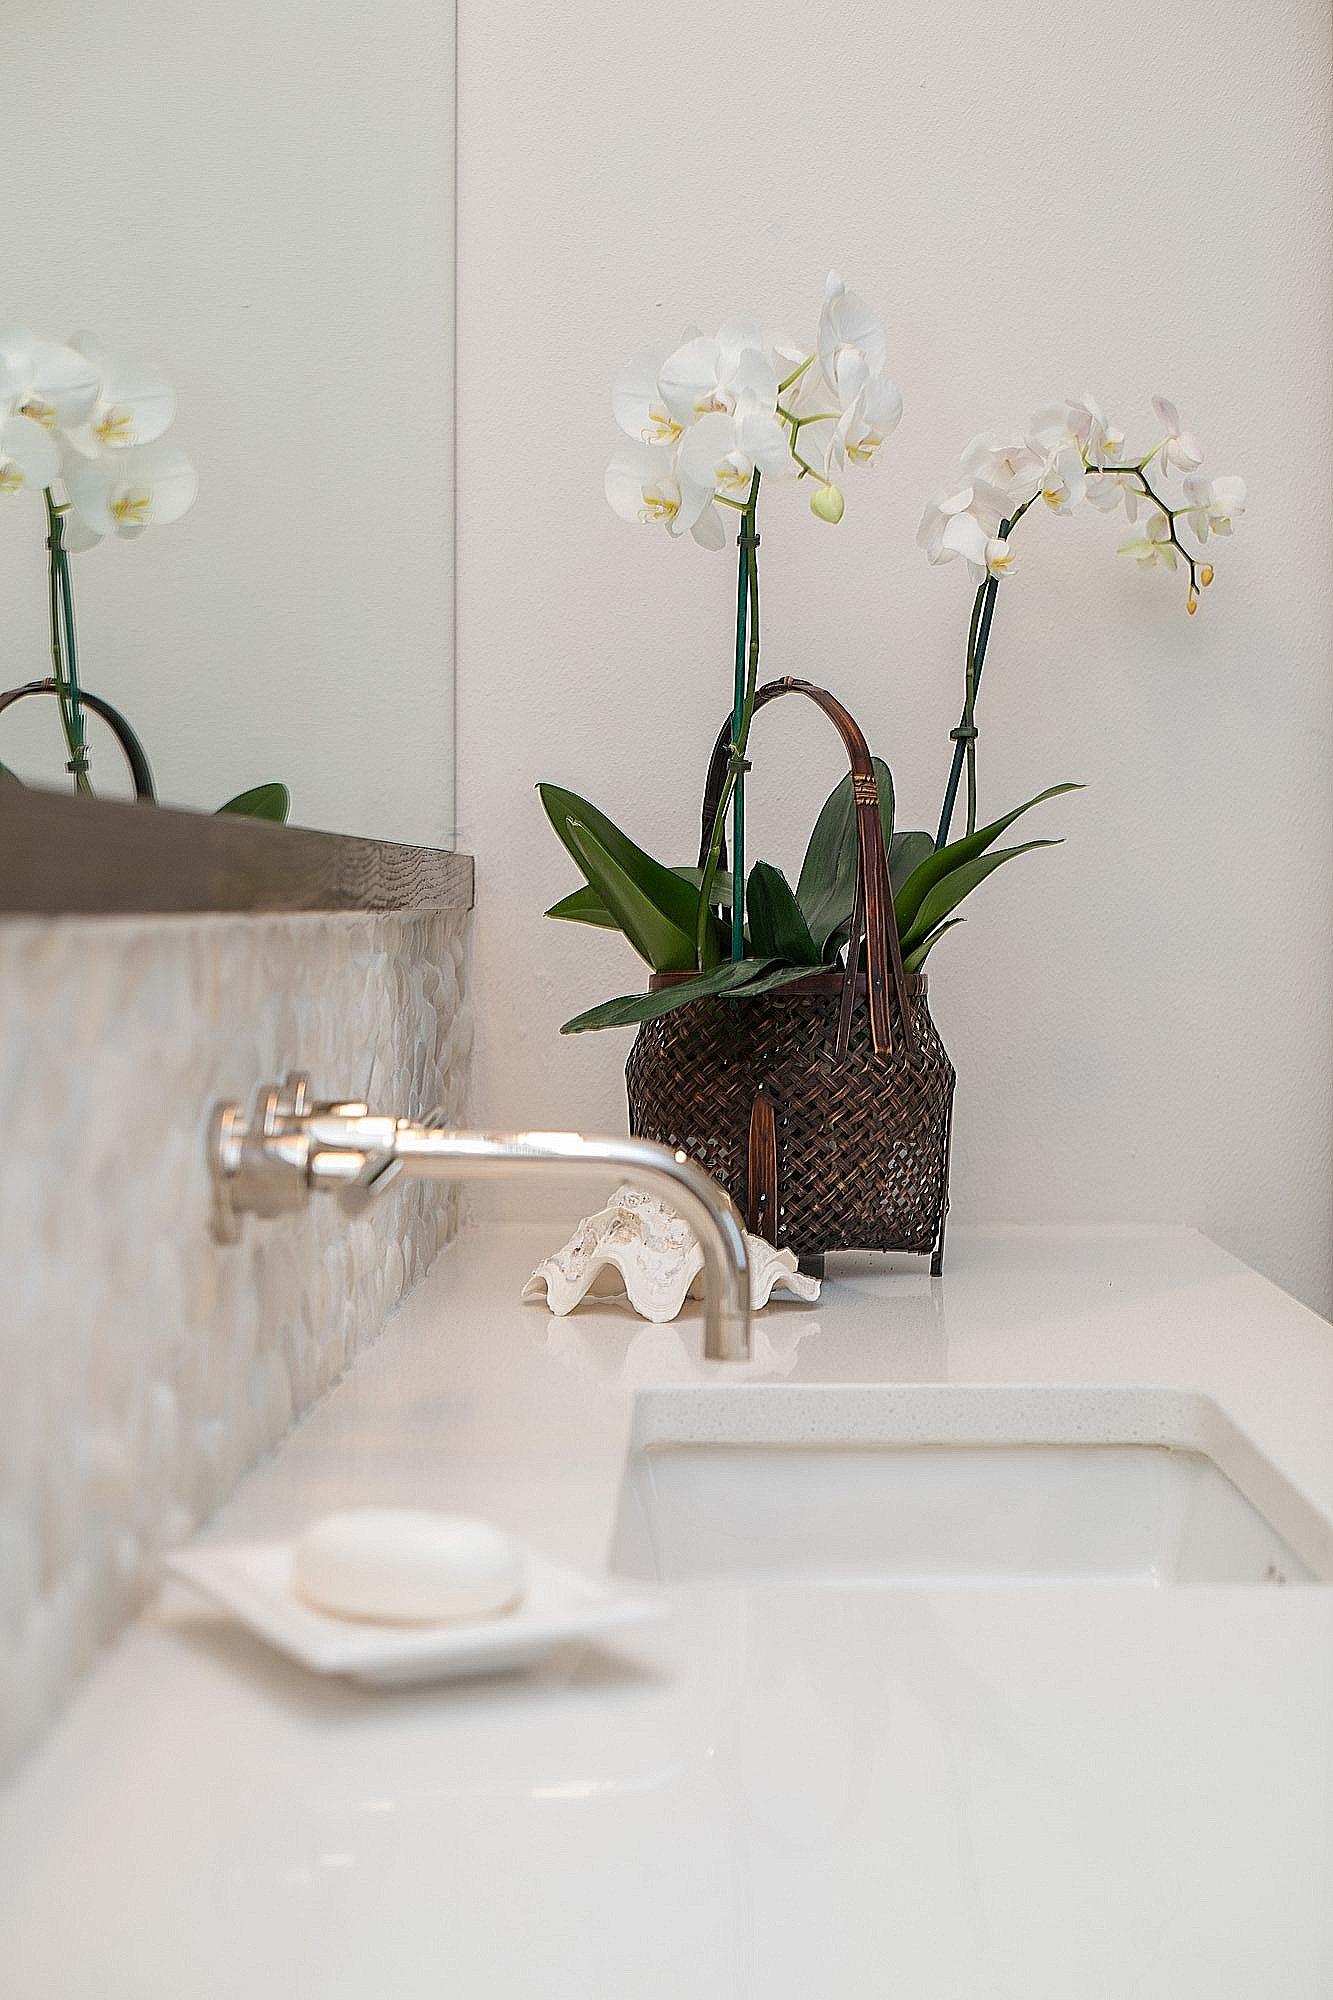 Master bathroom remodel with wall mount faucet on pebble tile backsplash | Interior Designer: Carla Aston / Photographer: Tori Aston #bathroomideas #bathroomremodel #wallmountfaucet #pebbletile